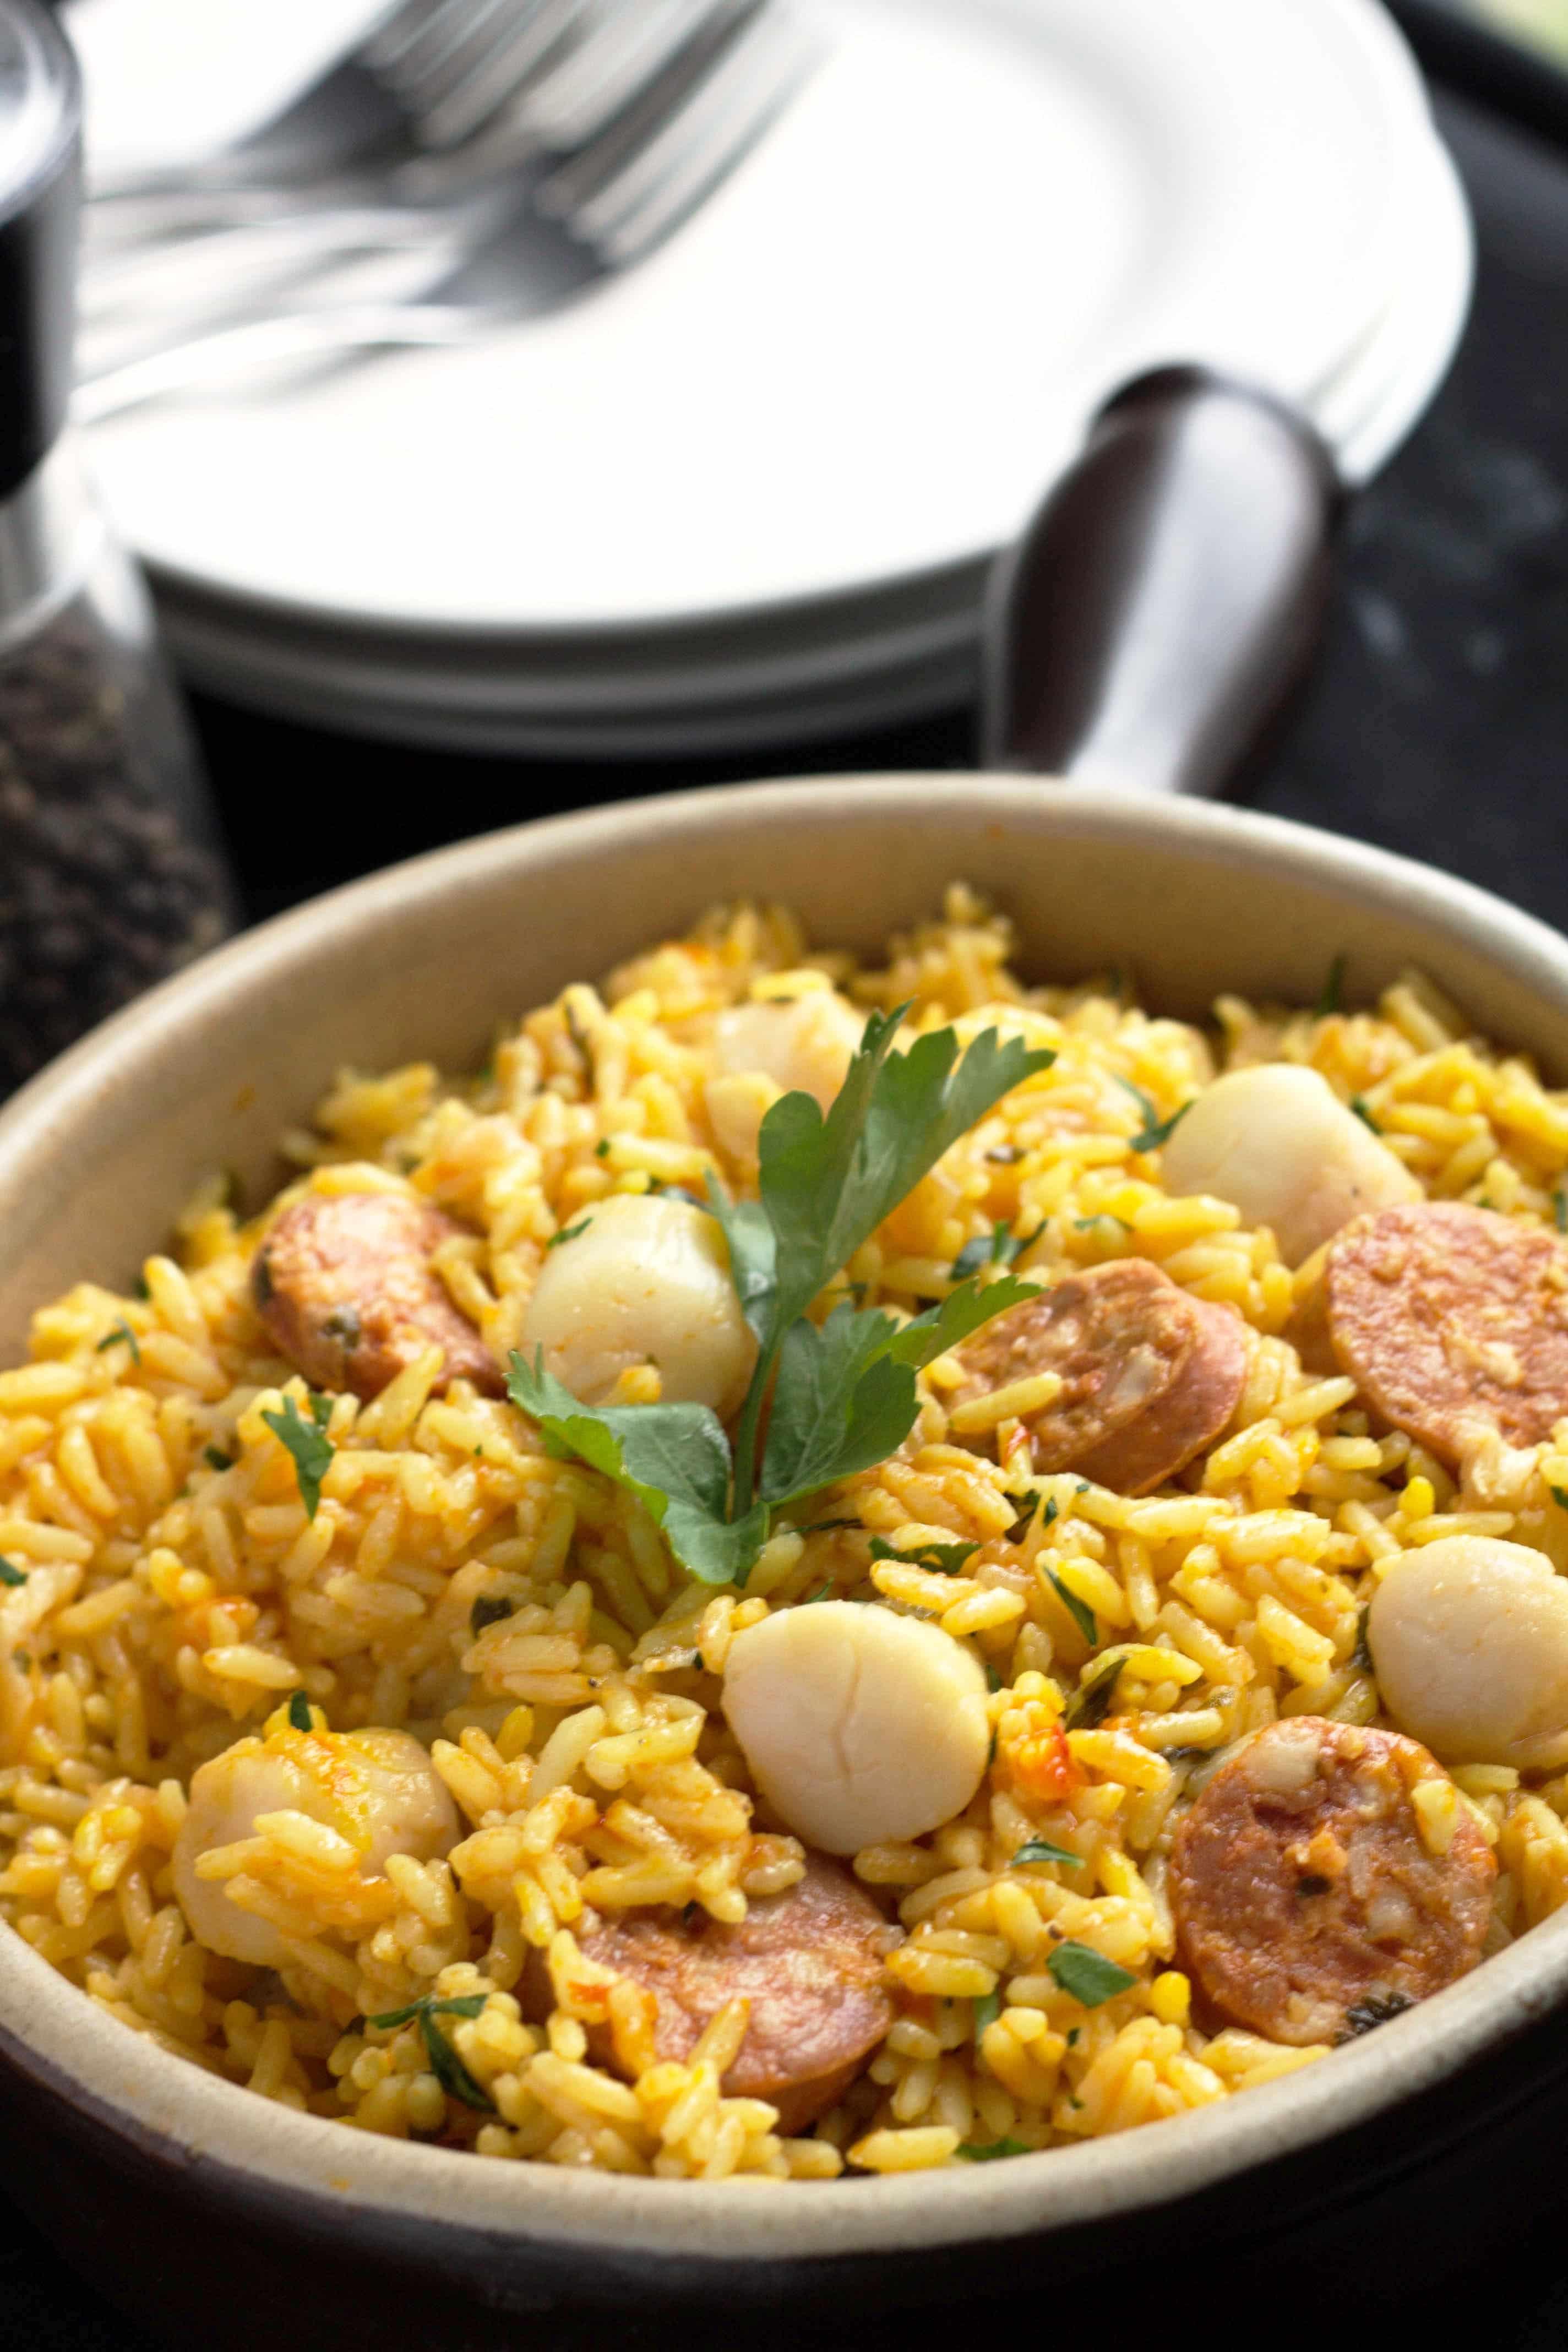 Shrimp and scallop easy paella recipe - Food next recipes